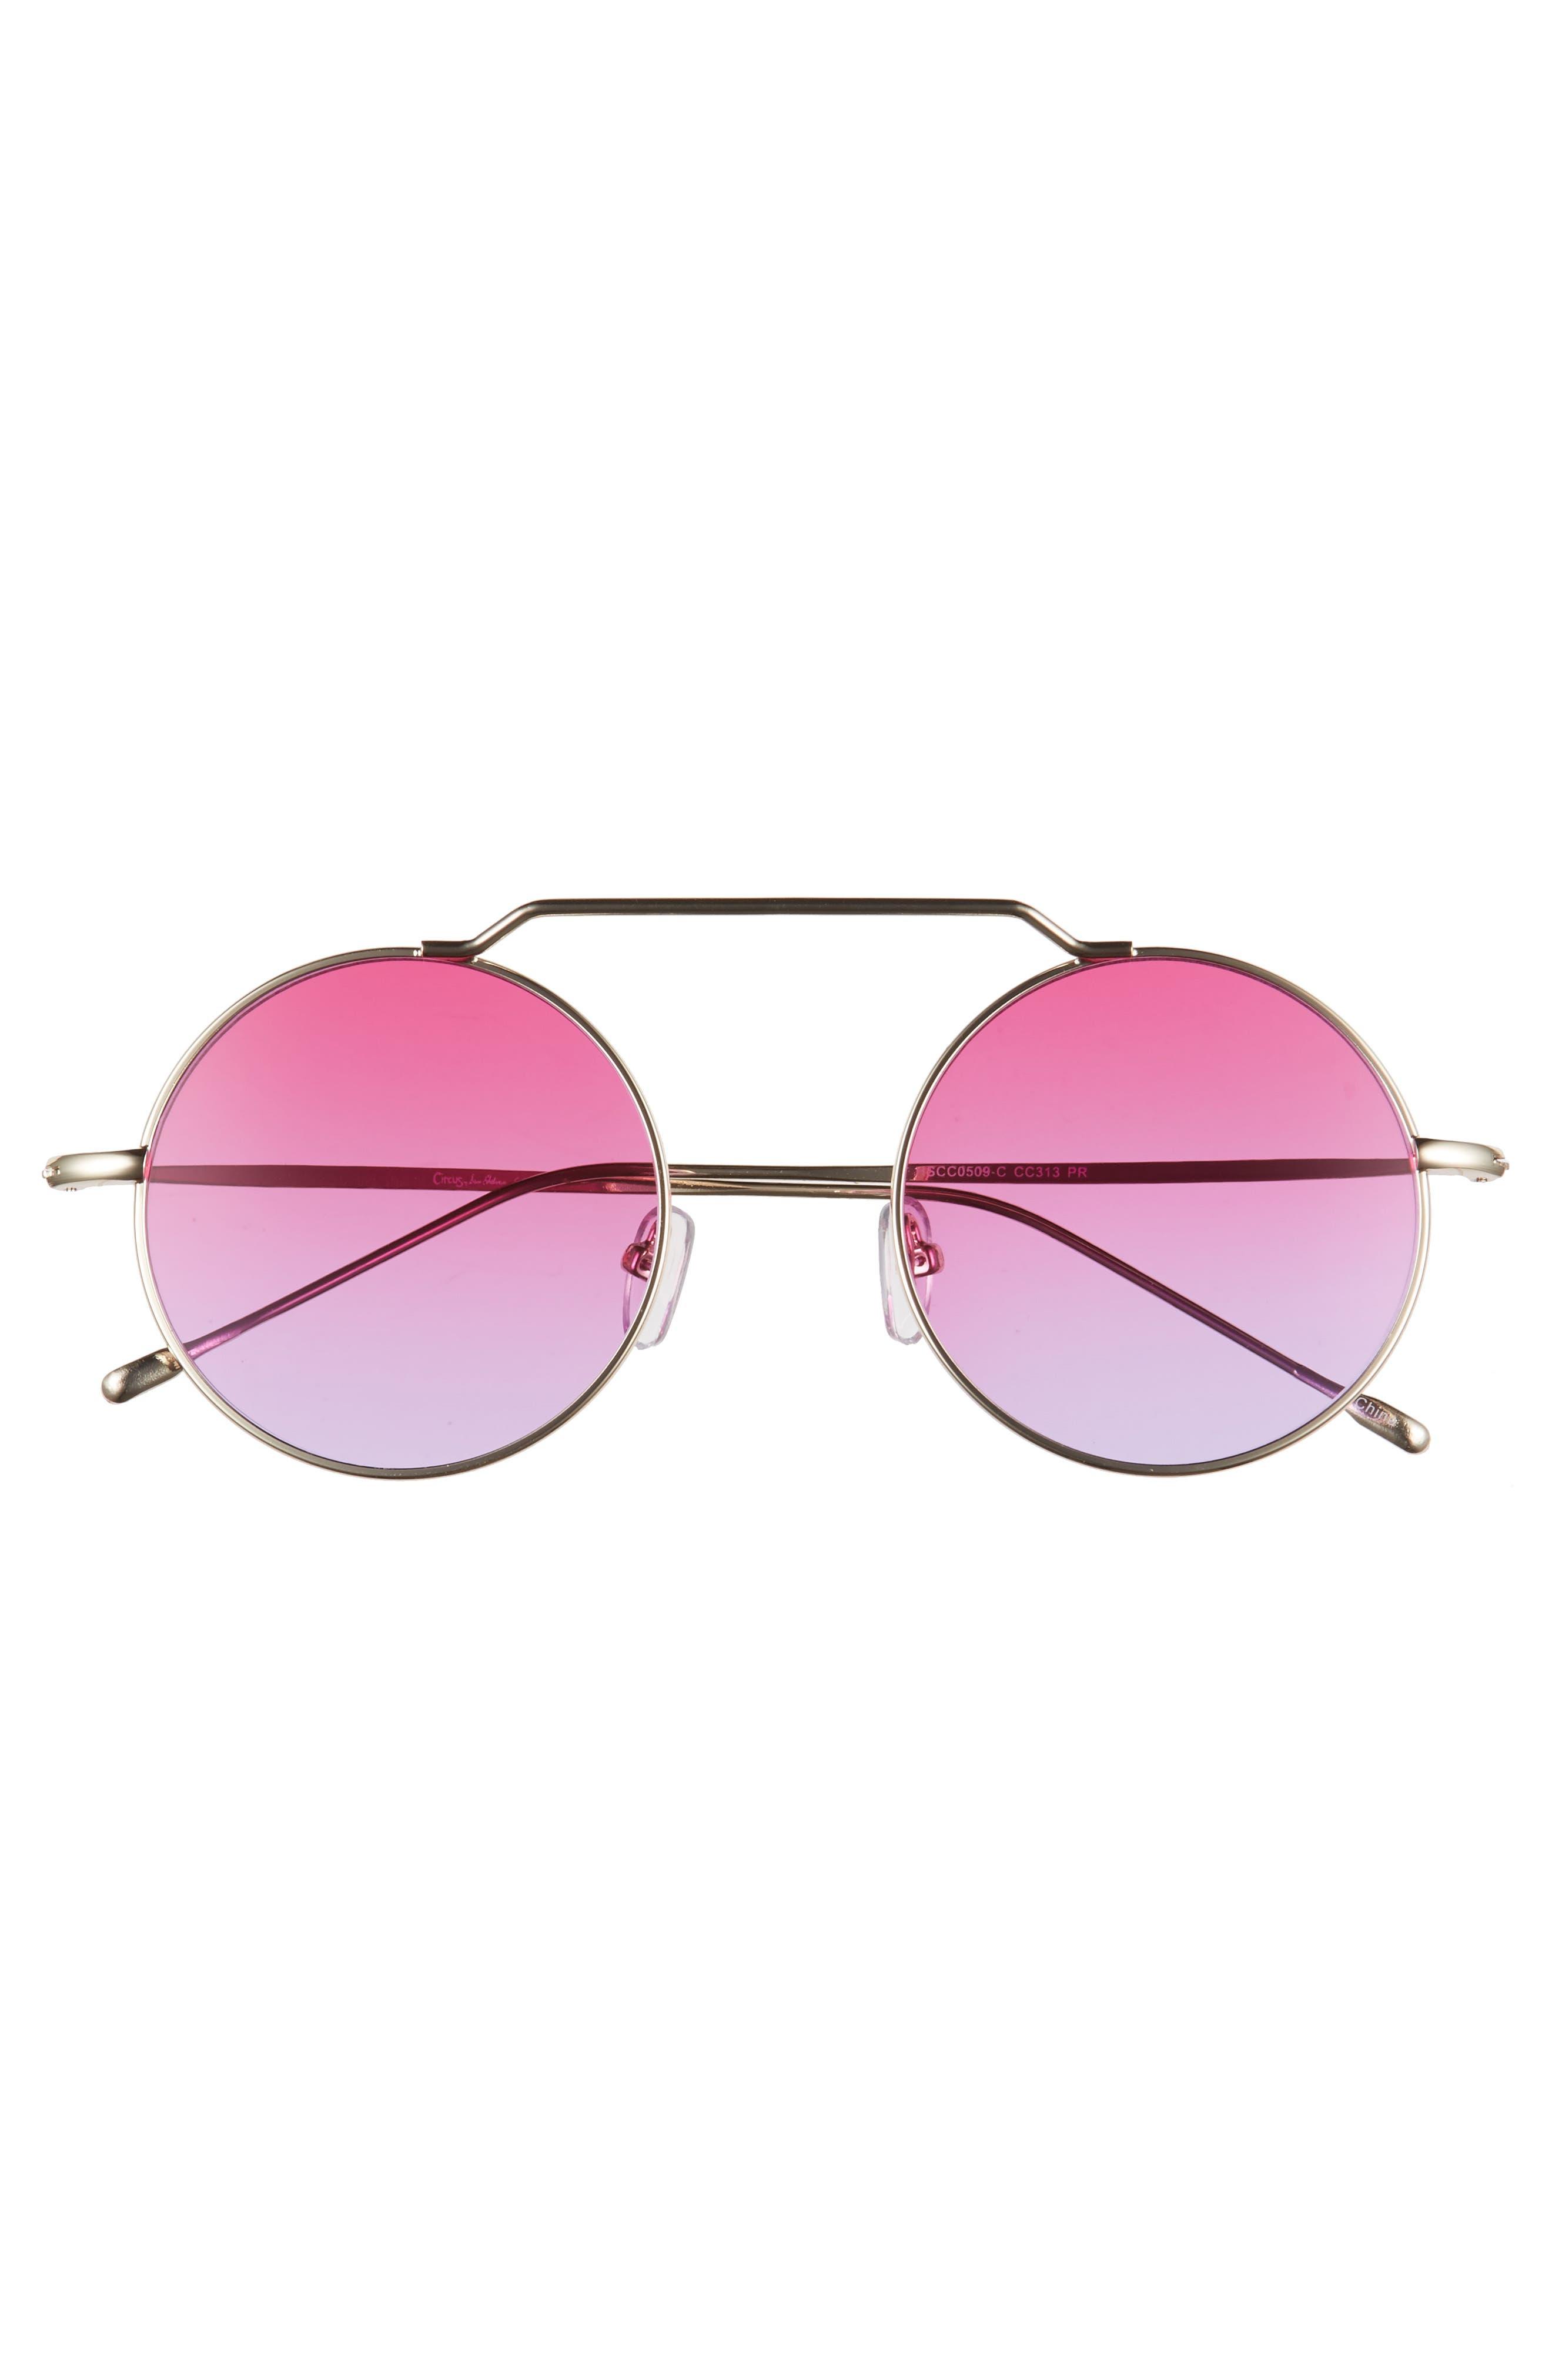 51mm Brow Bar Round Sunglasses,                             Alternate thumbnail 9, color,